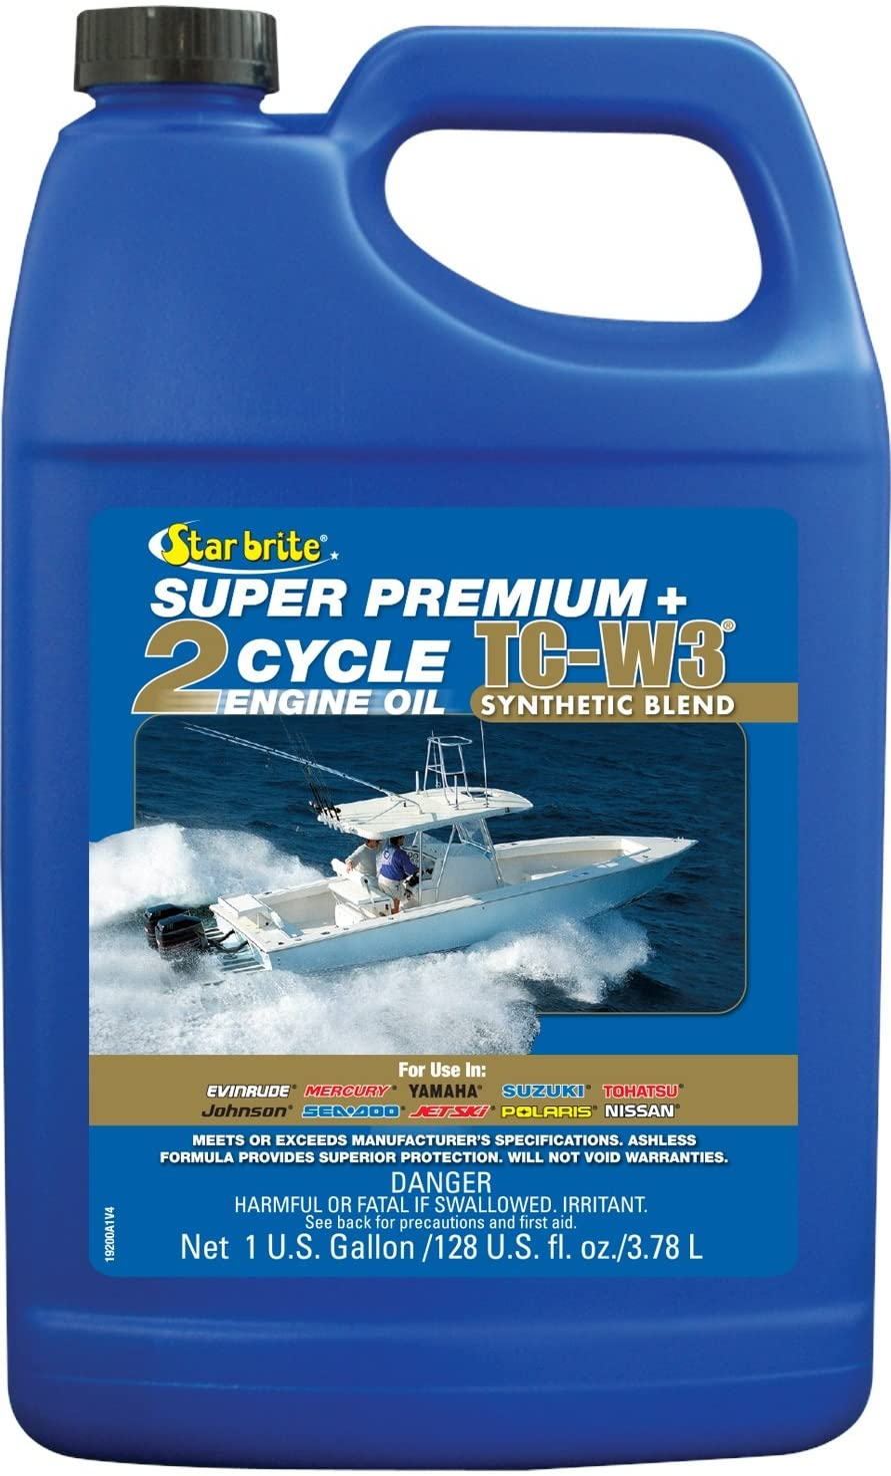 Star brite Super Premium 2-Cycle Engine Oil TC-W3